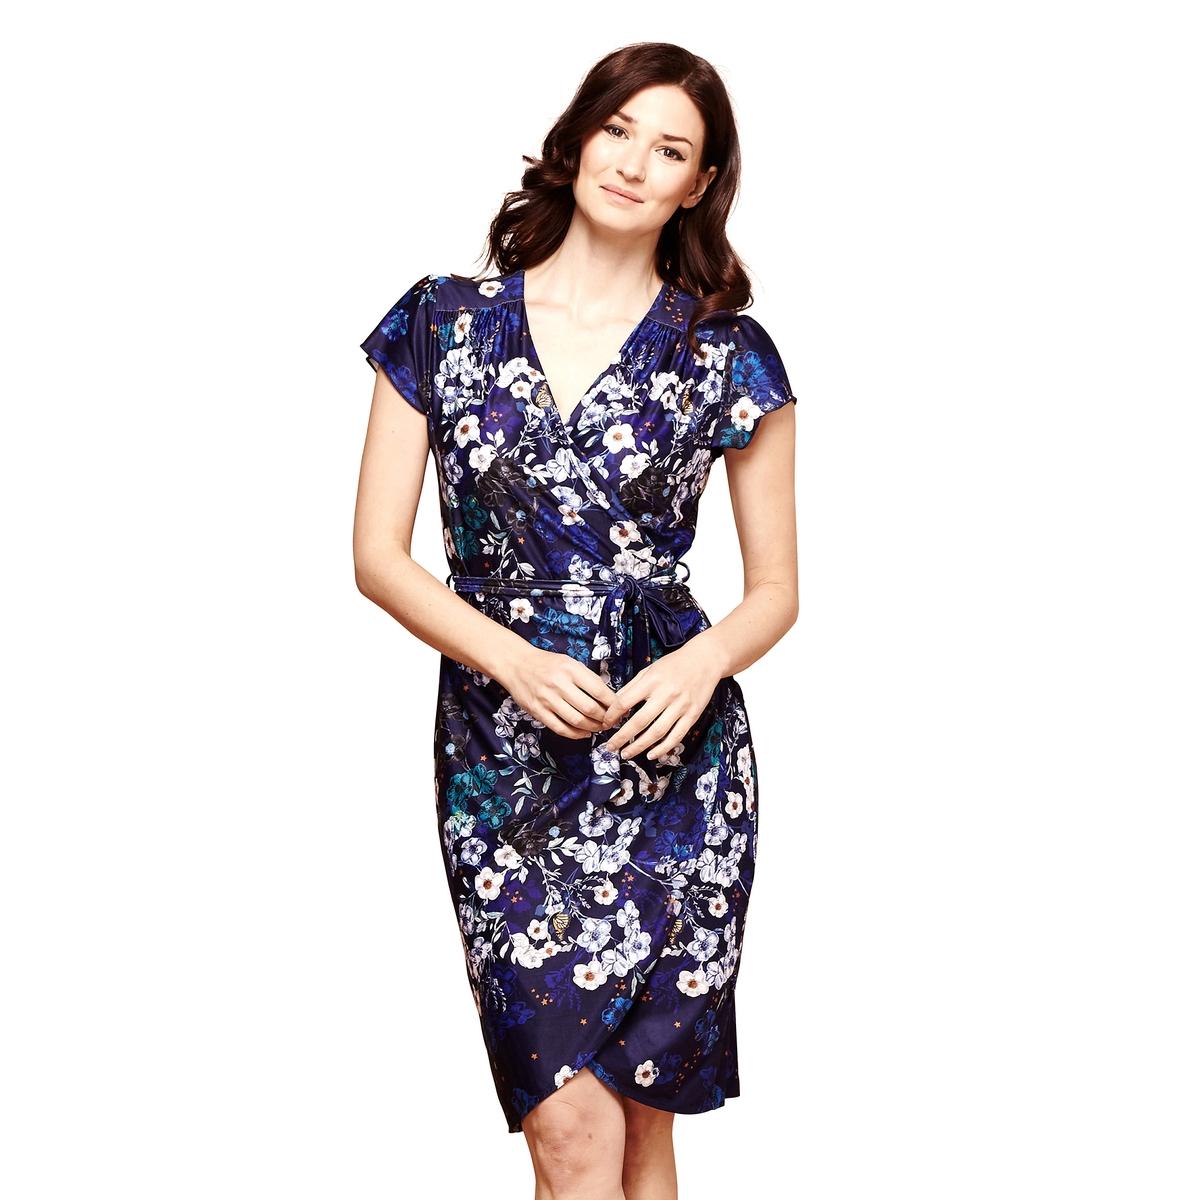 Платье короткое с короткими рукавами платье yumi yumi платье